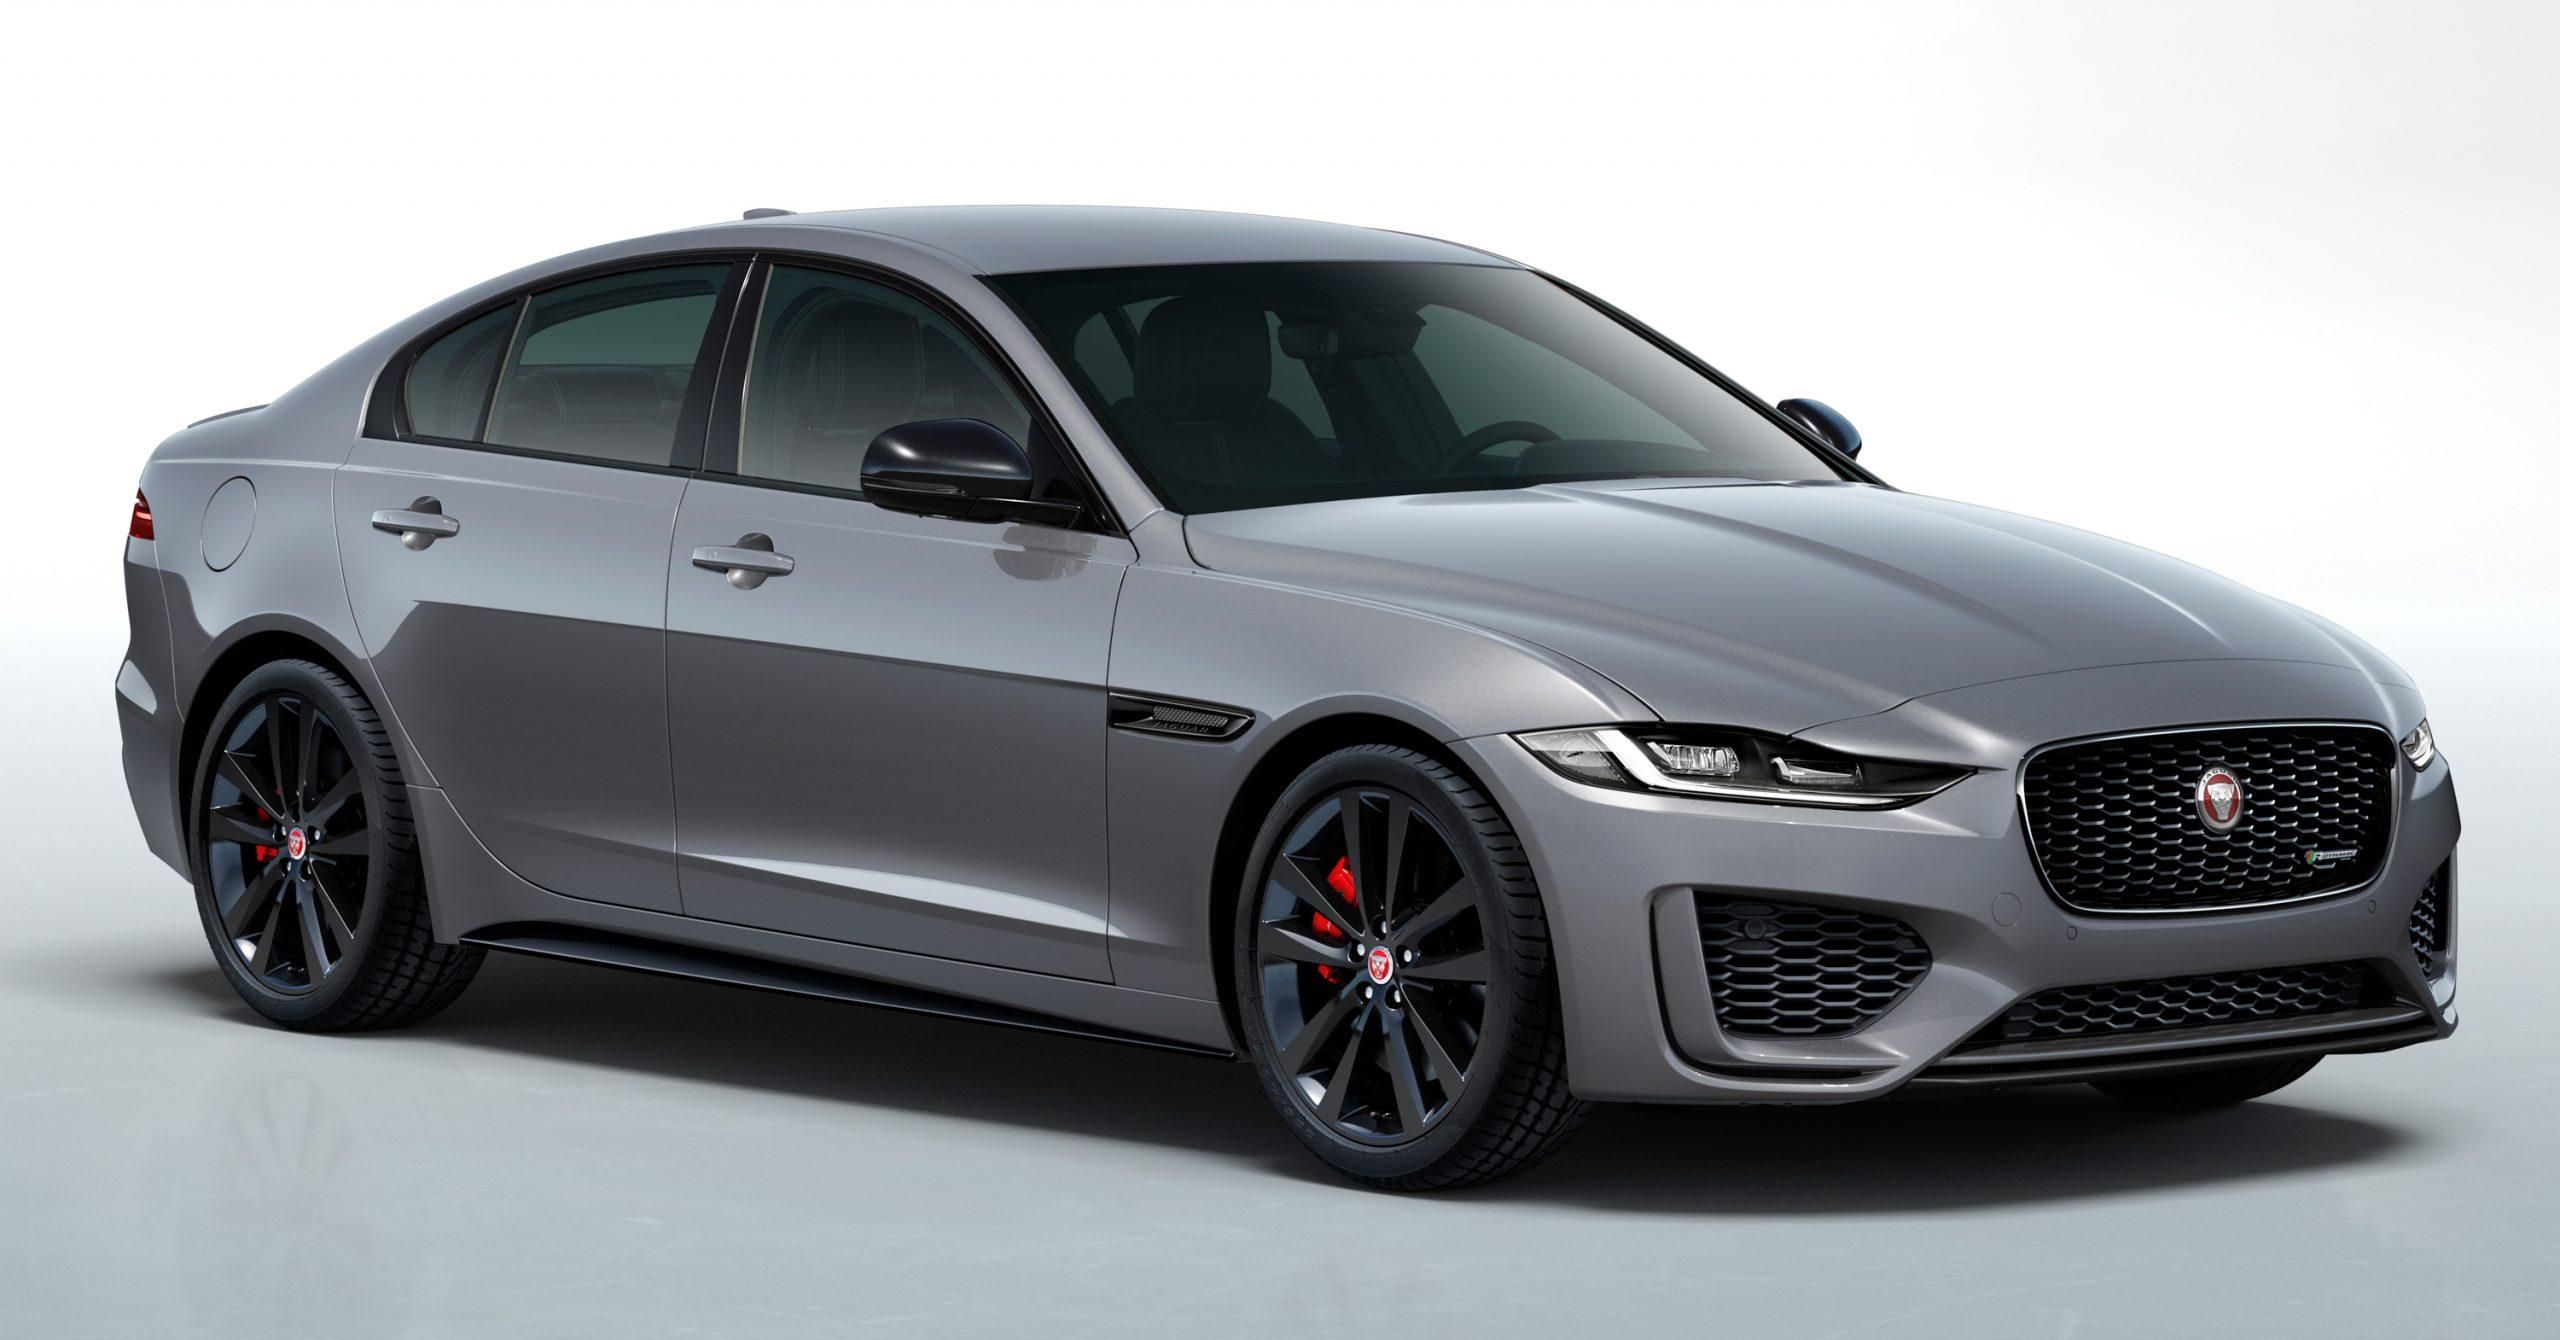 2021 Jaguar XJ: Maximum Luxury Electric Sedan - DAX Street